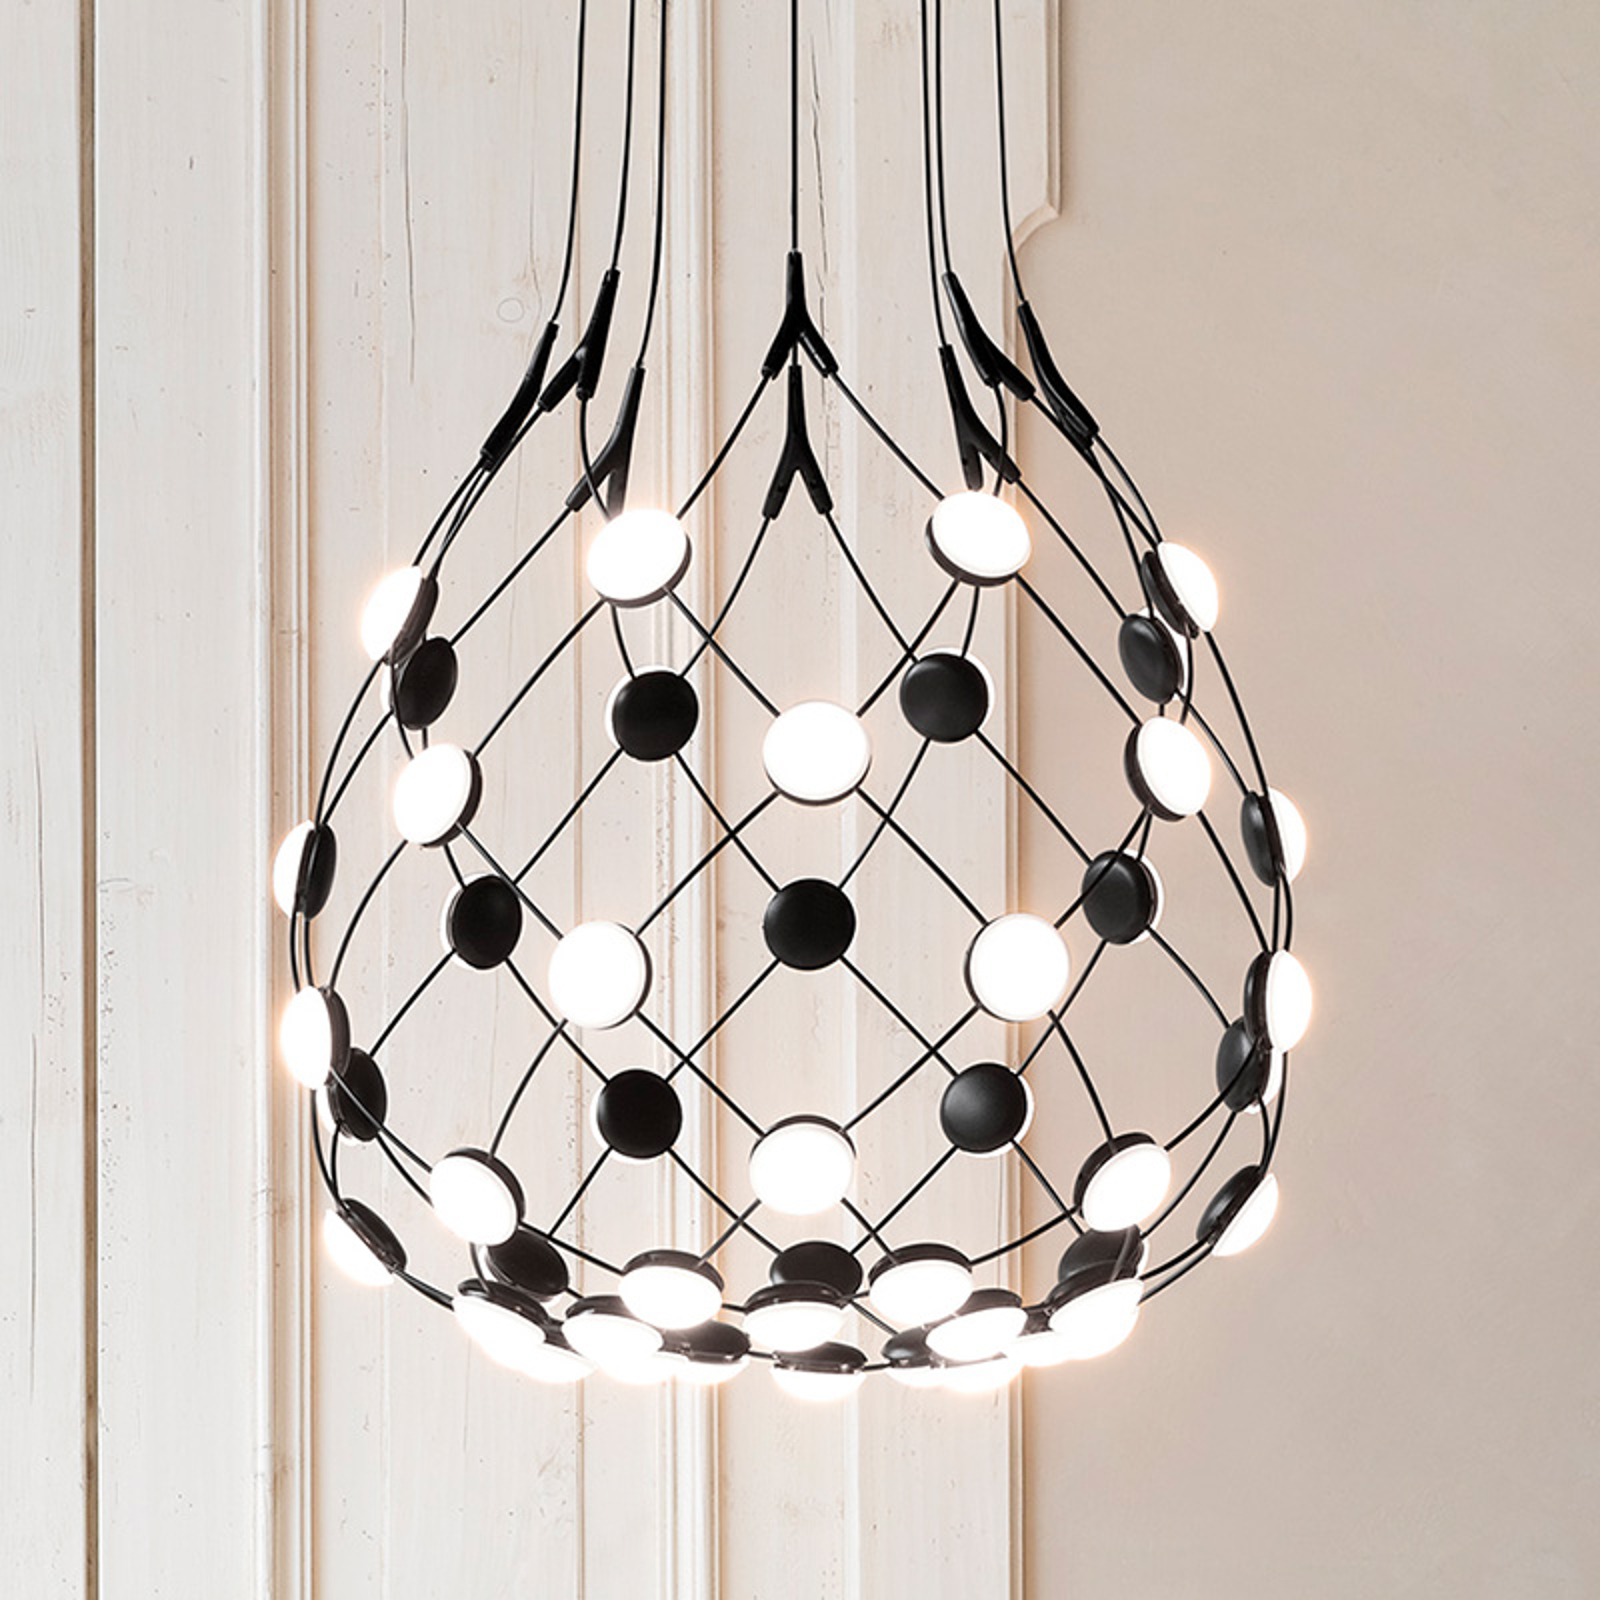 Luceplan Mesh lampa wisząca 55cm